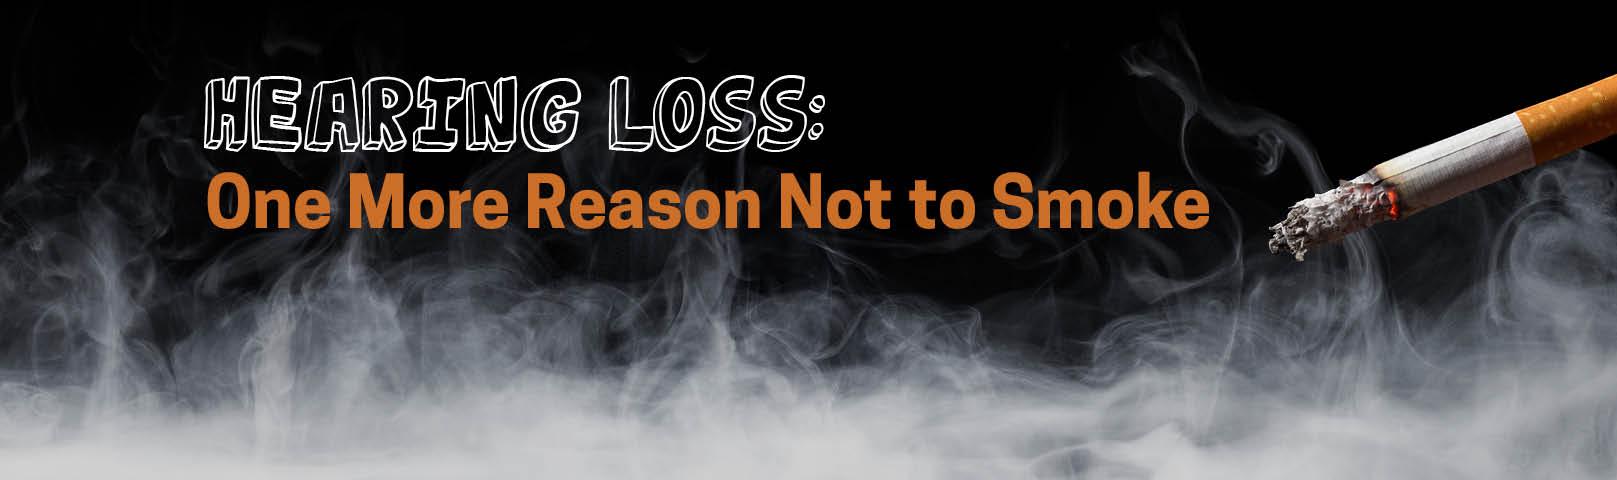 Hearing Loss: One More Reason Not to Smoke